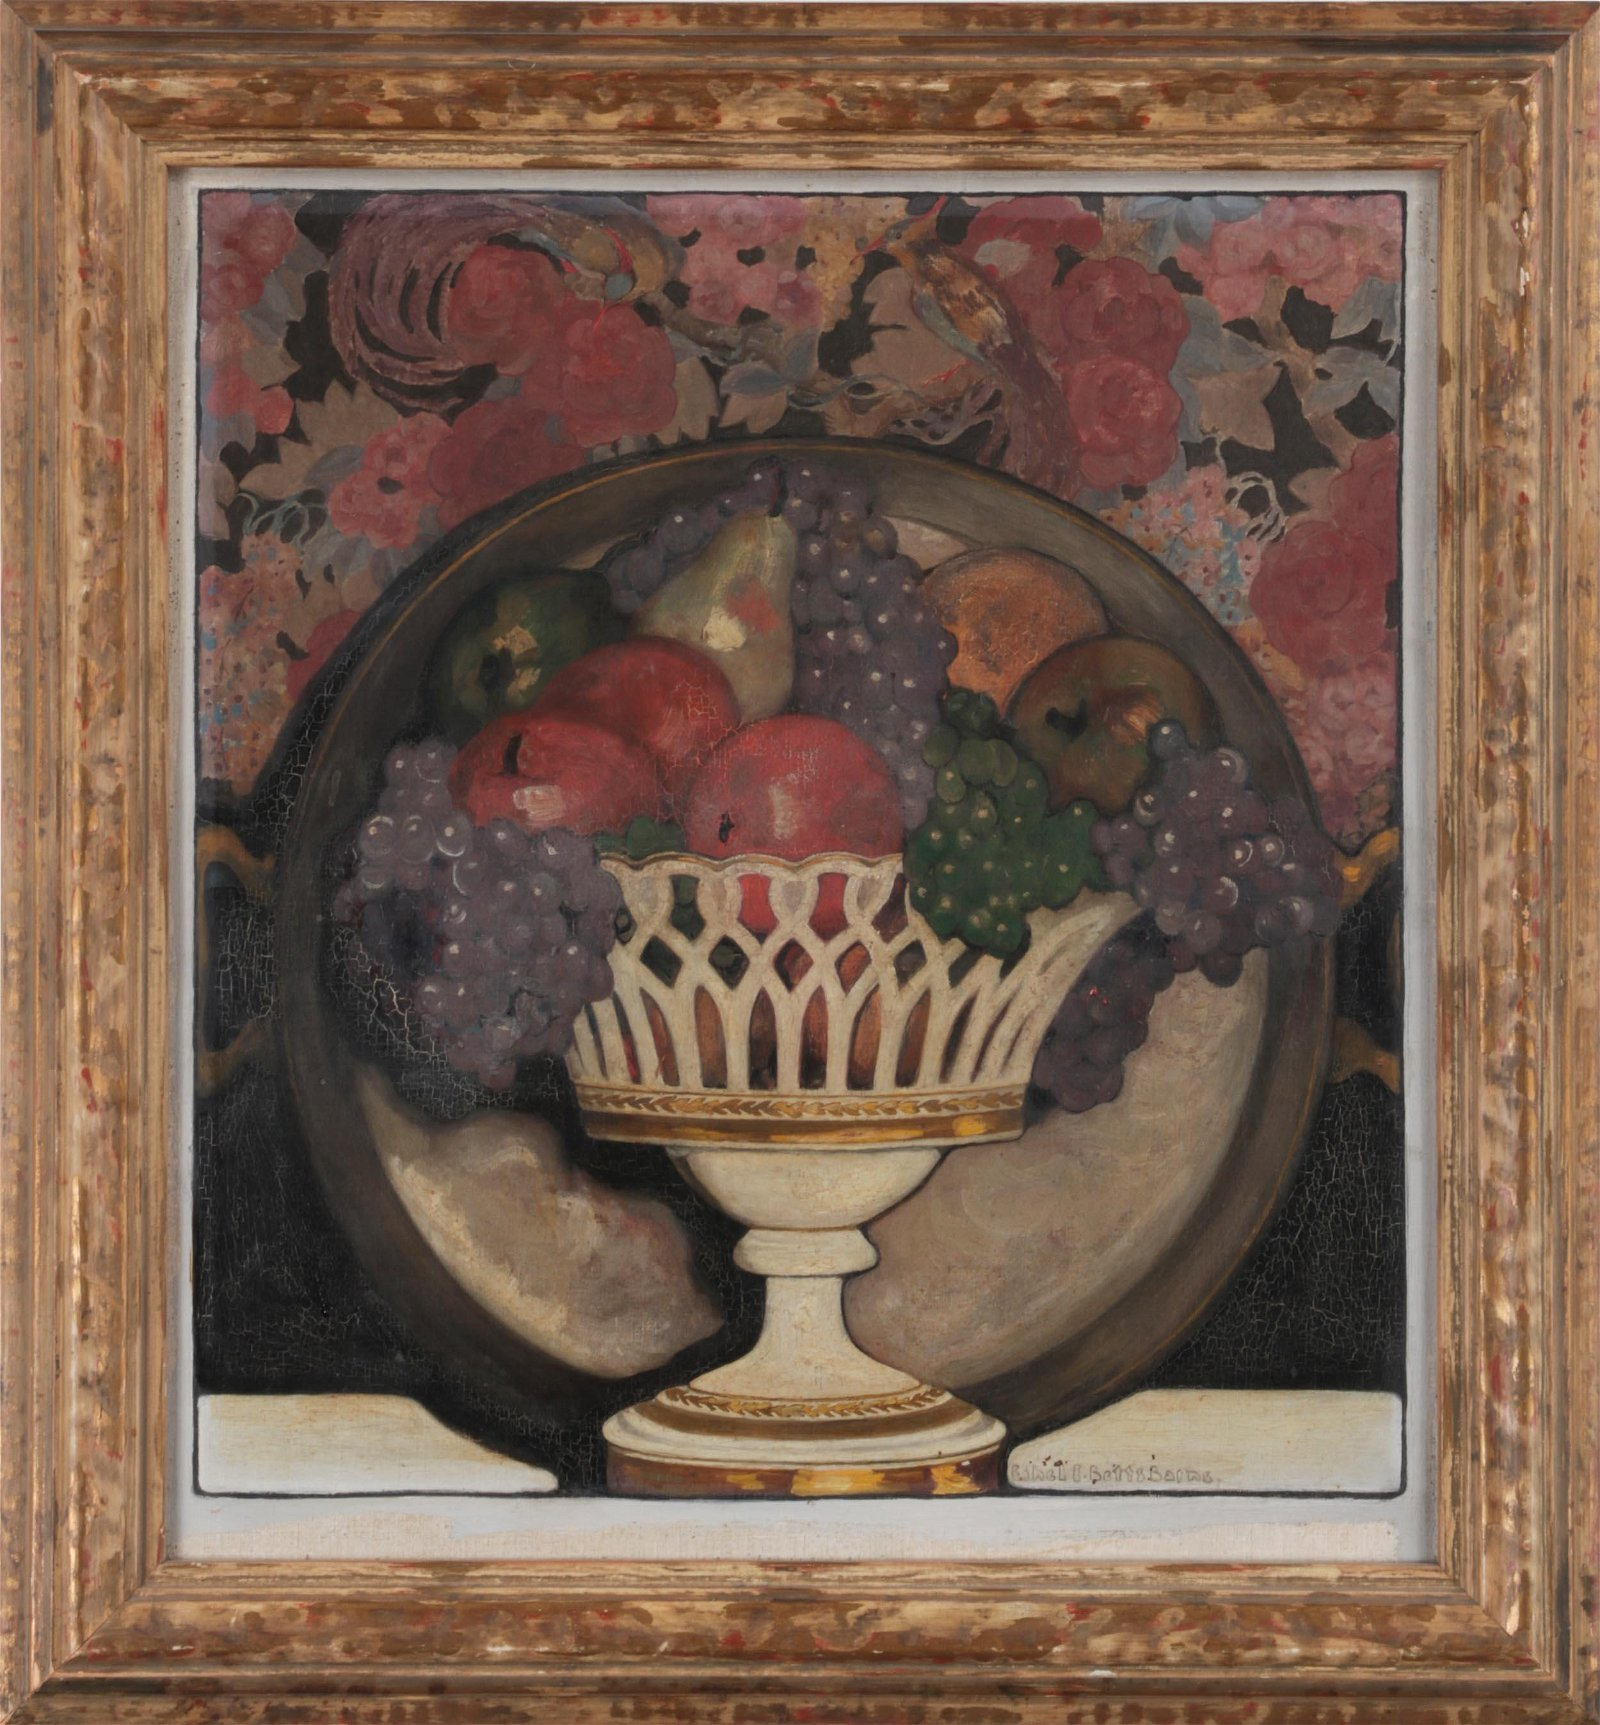 ETHEL FRANKLIN (BAINS) BETTS (American, 1877-1959)